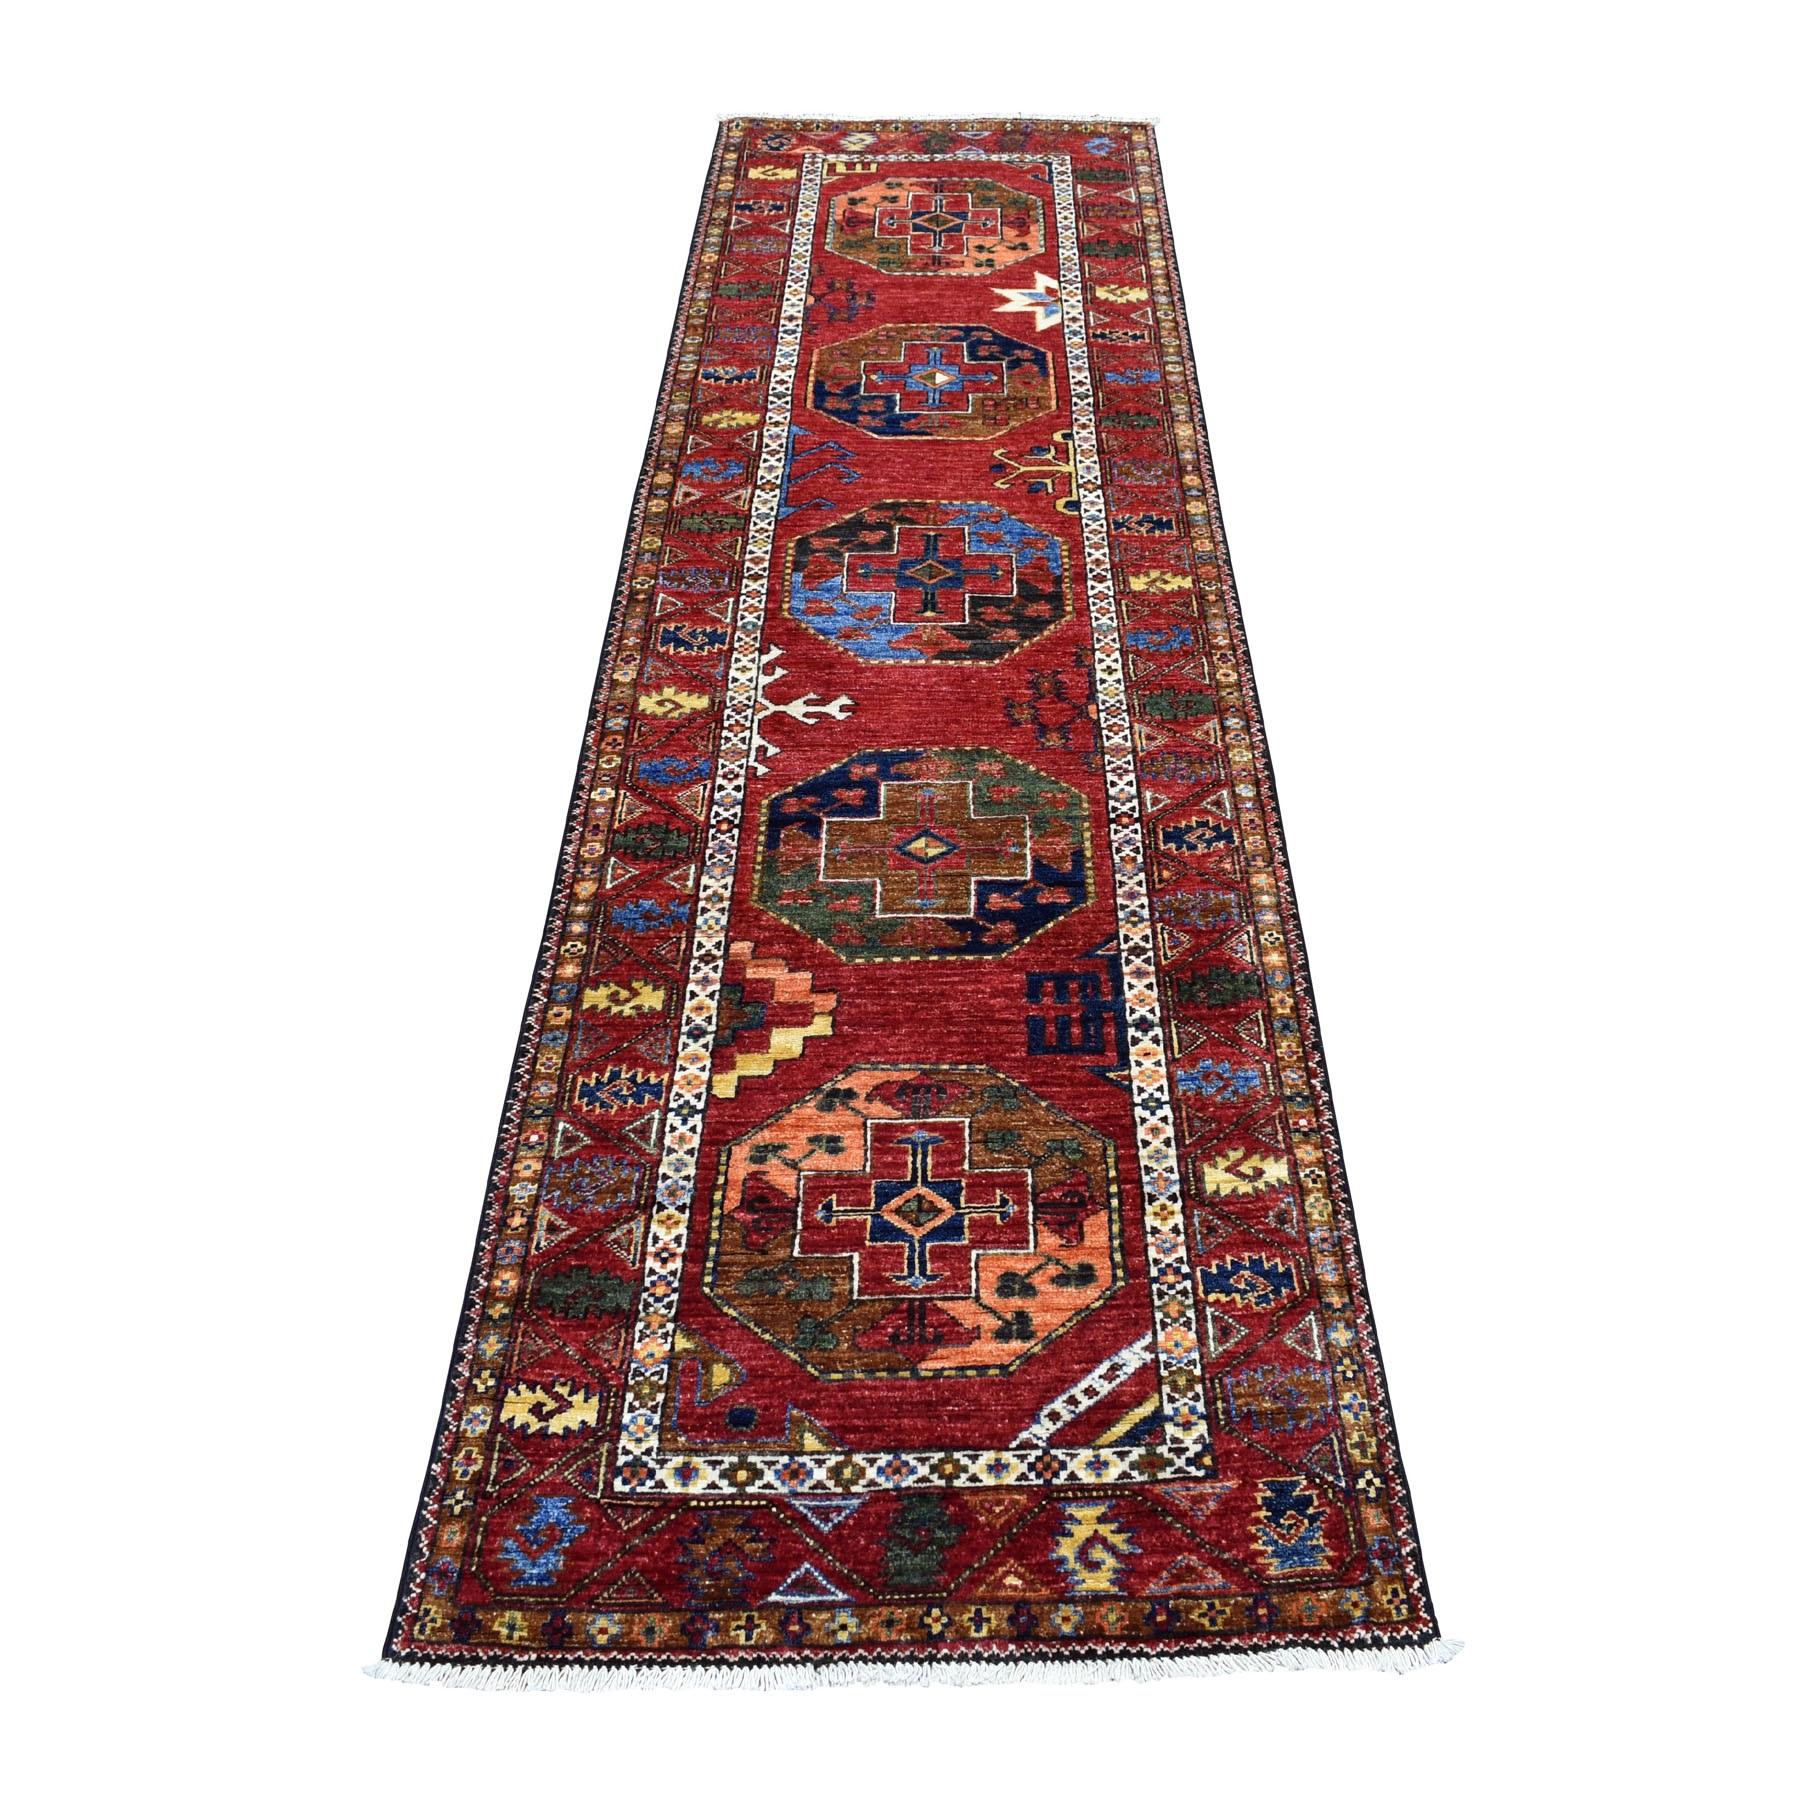 "2'8""X9'2"" Red Afghan Ersari Elephant Feet Design Pure Wool Hand Knotted Oriental Rug moaec006"